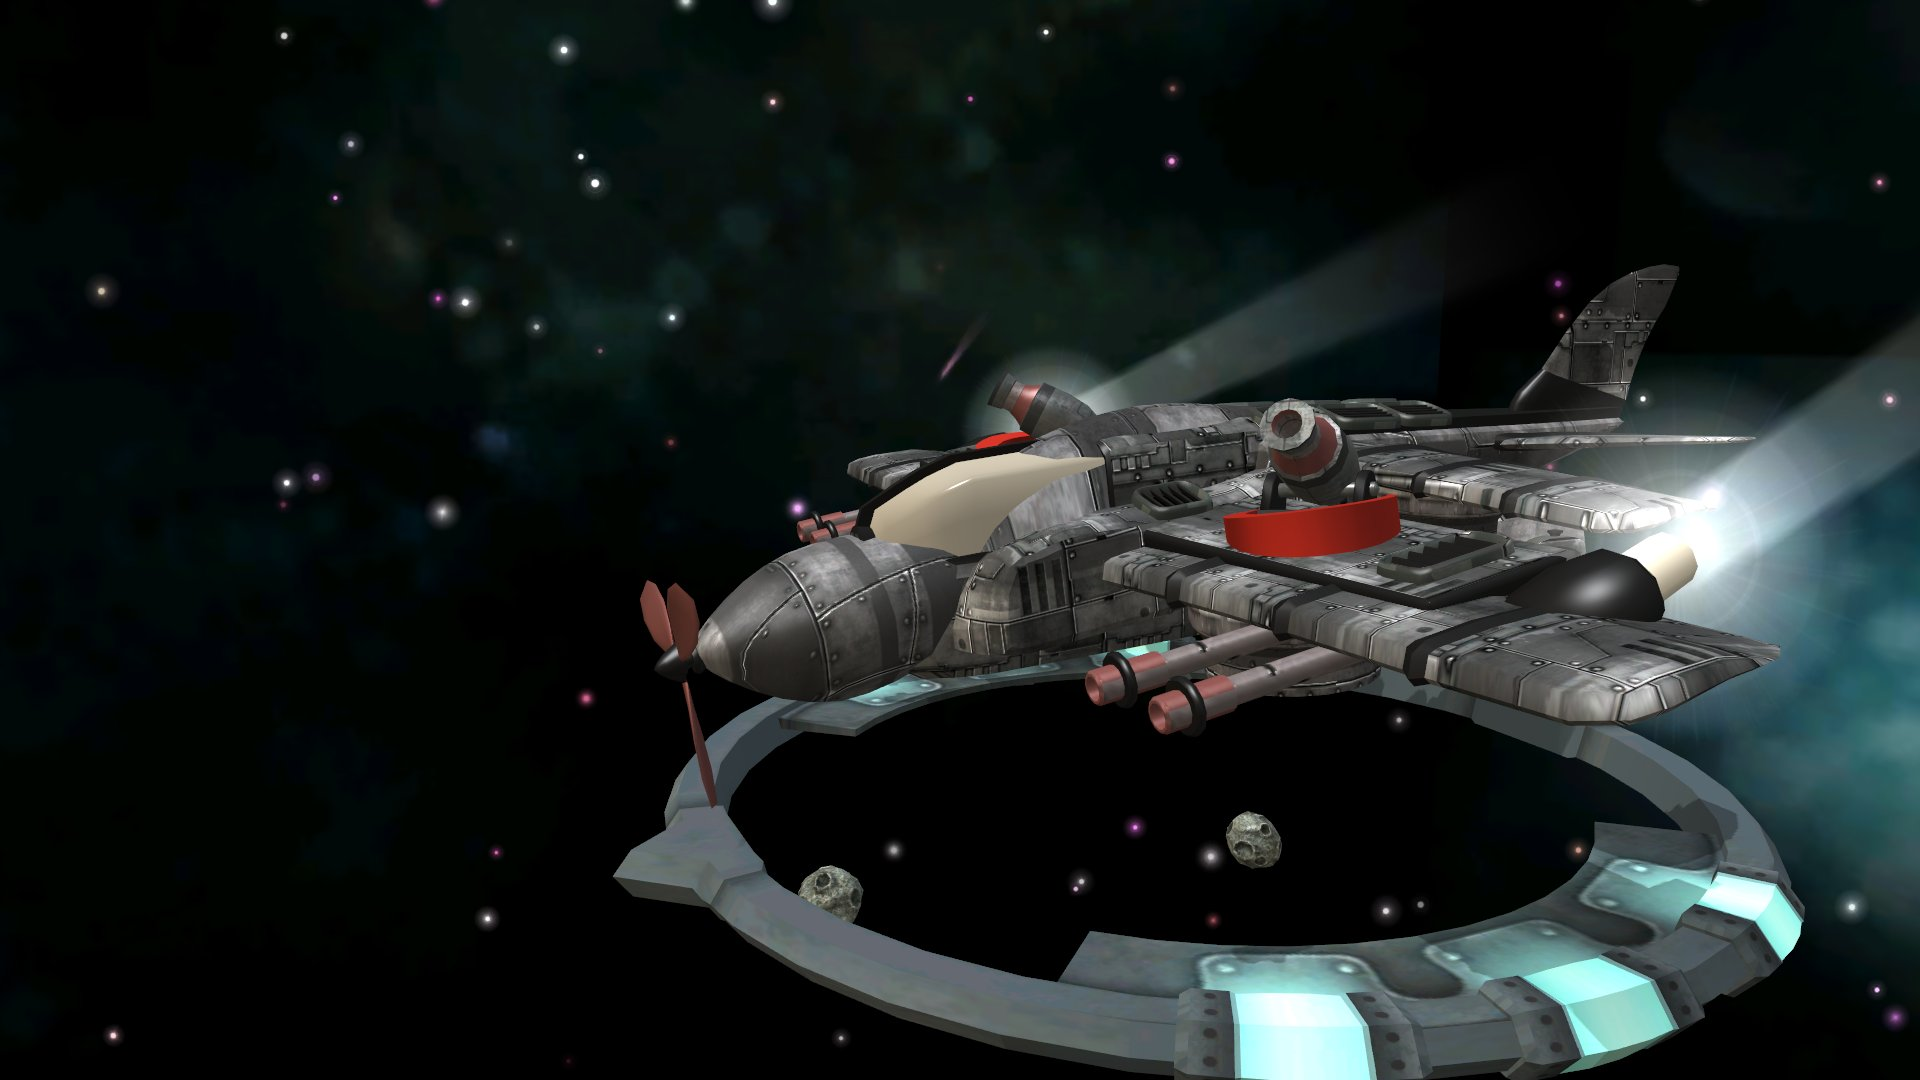 (21) Naves del imperio Neimerer IuaOf8L